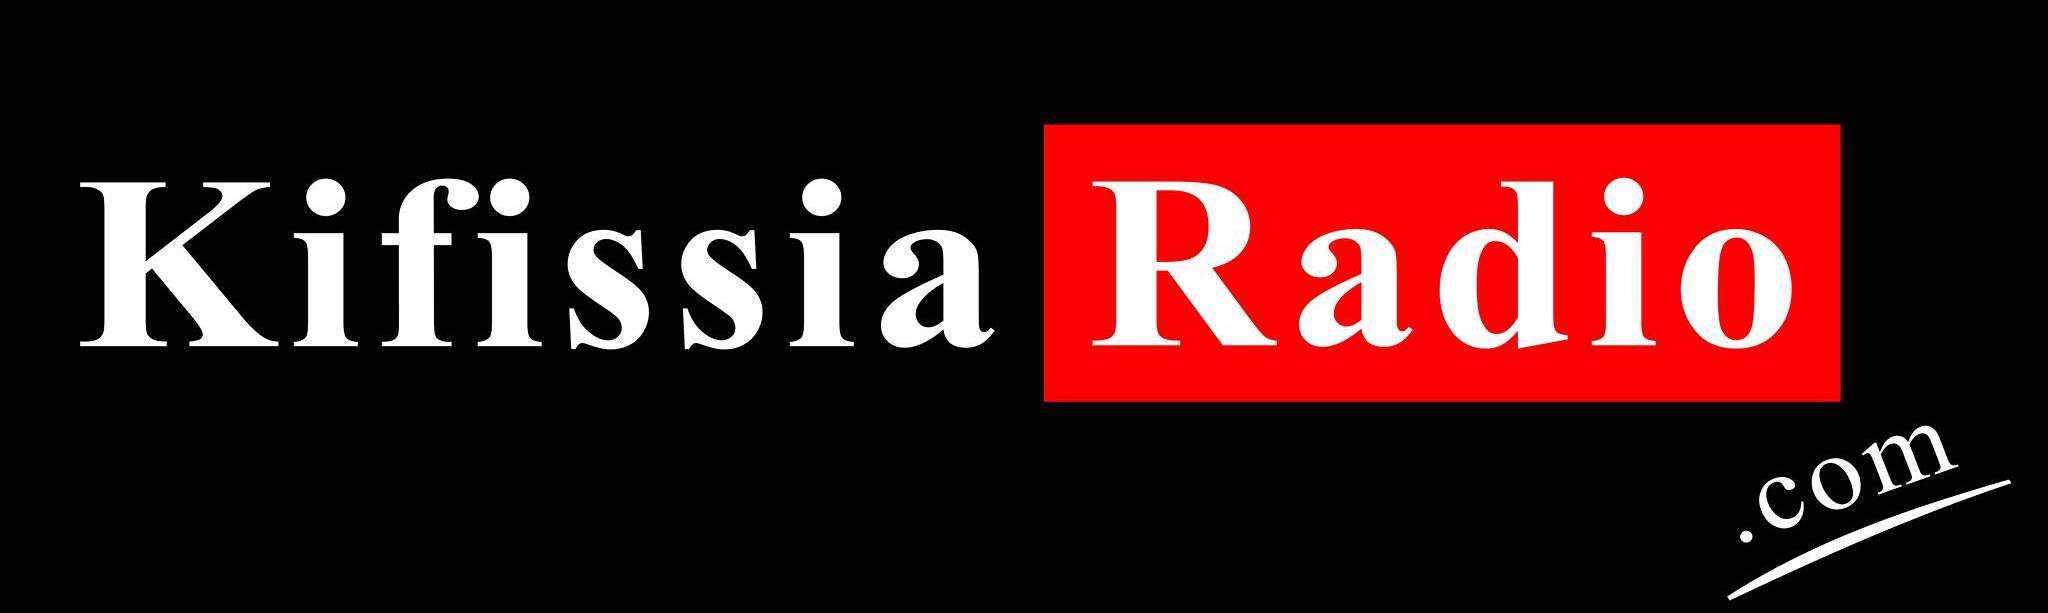 Kifissia Radio Logo